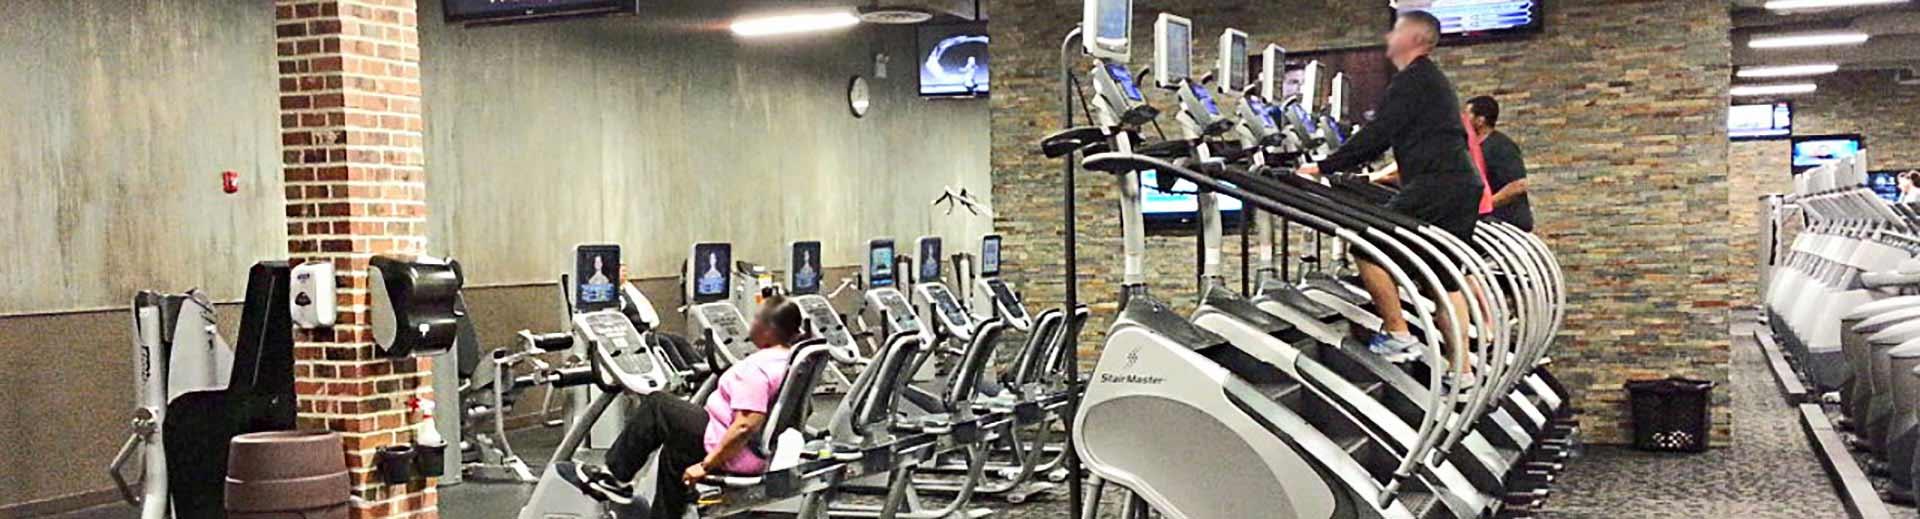 Massapequa Gym Amenities New York Gym Xsport Fitness